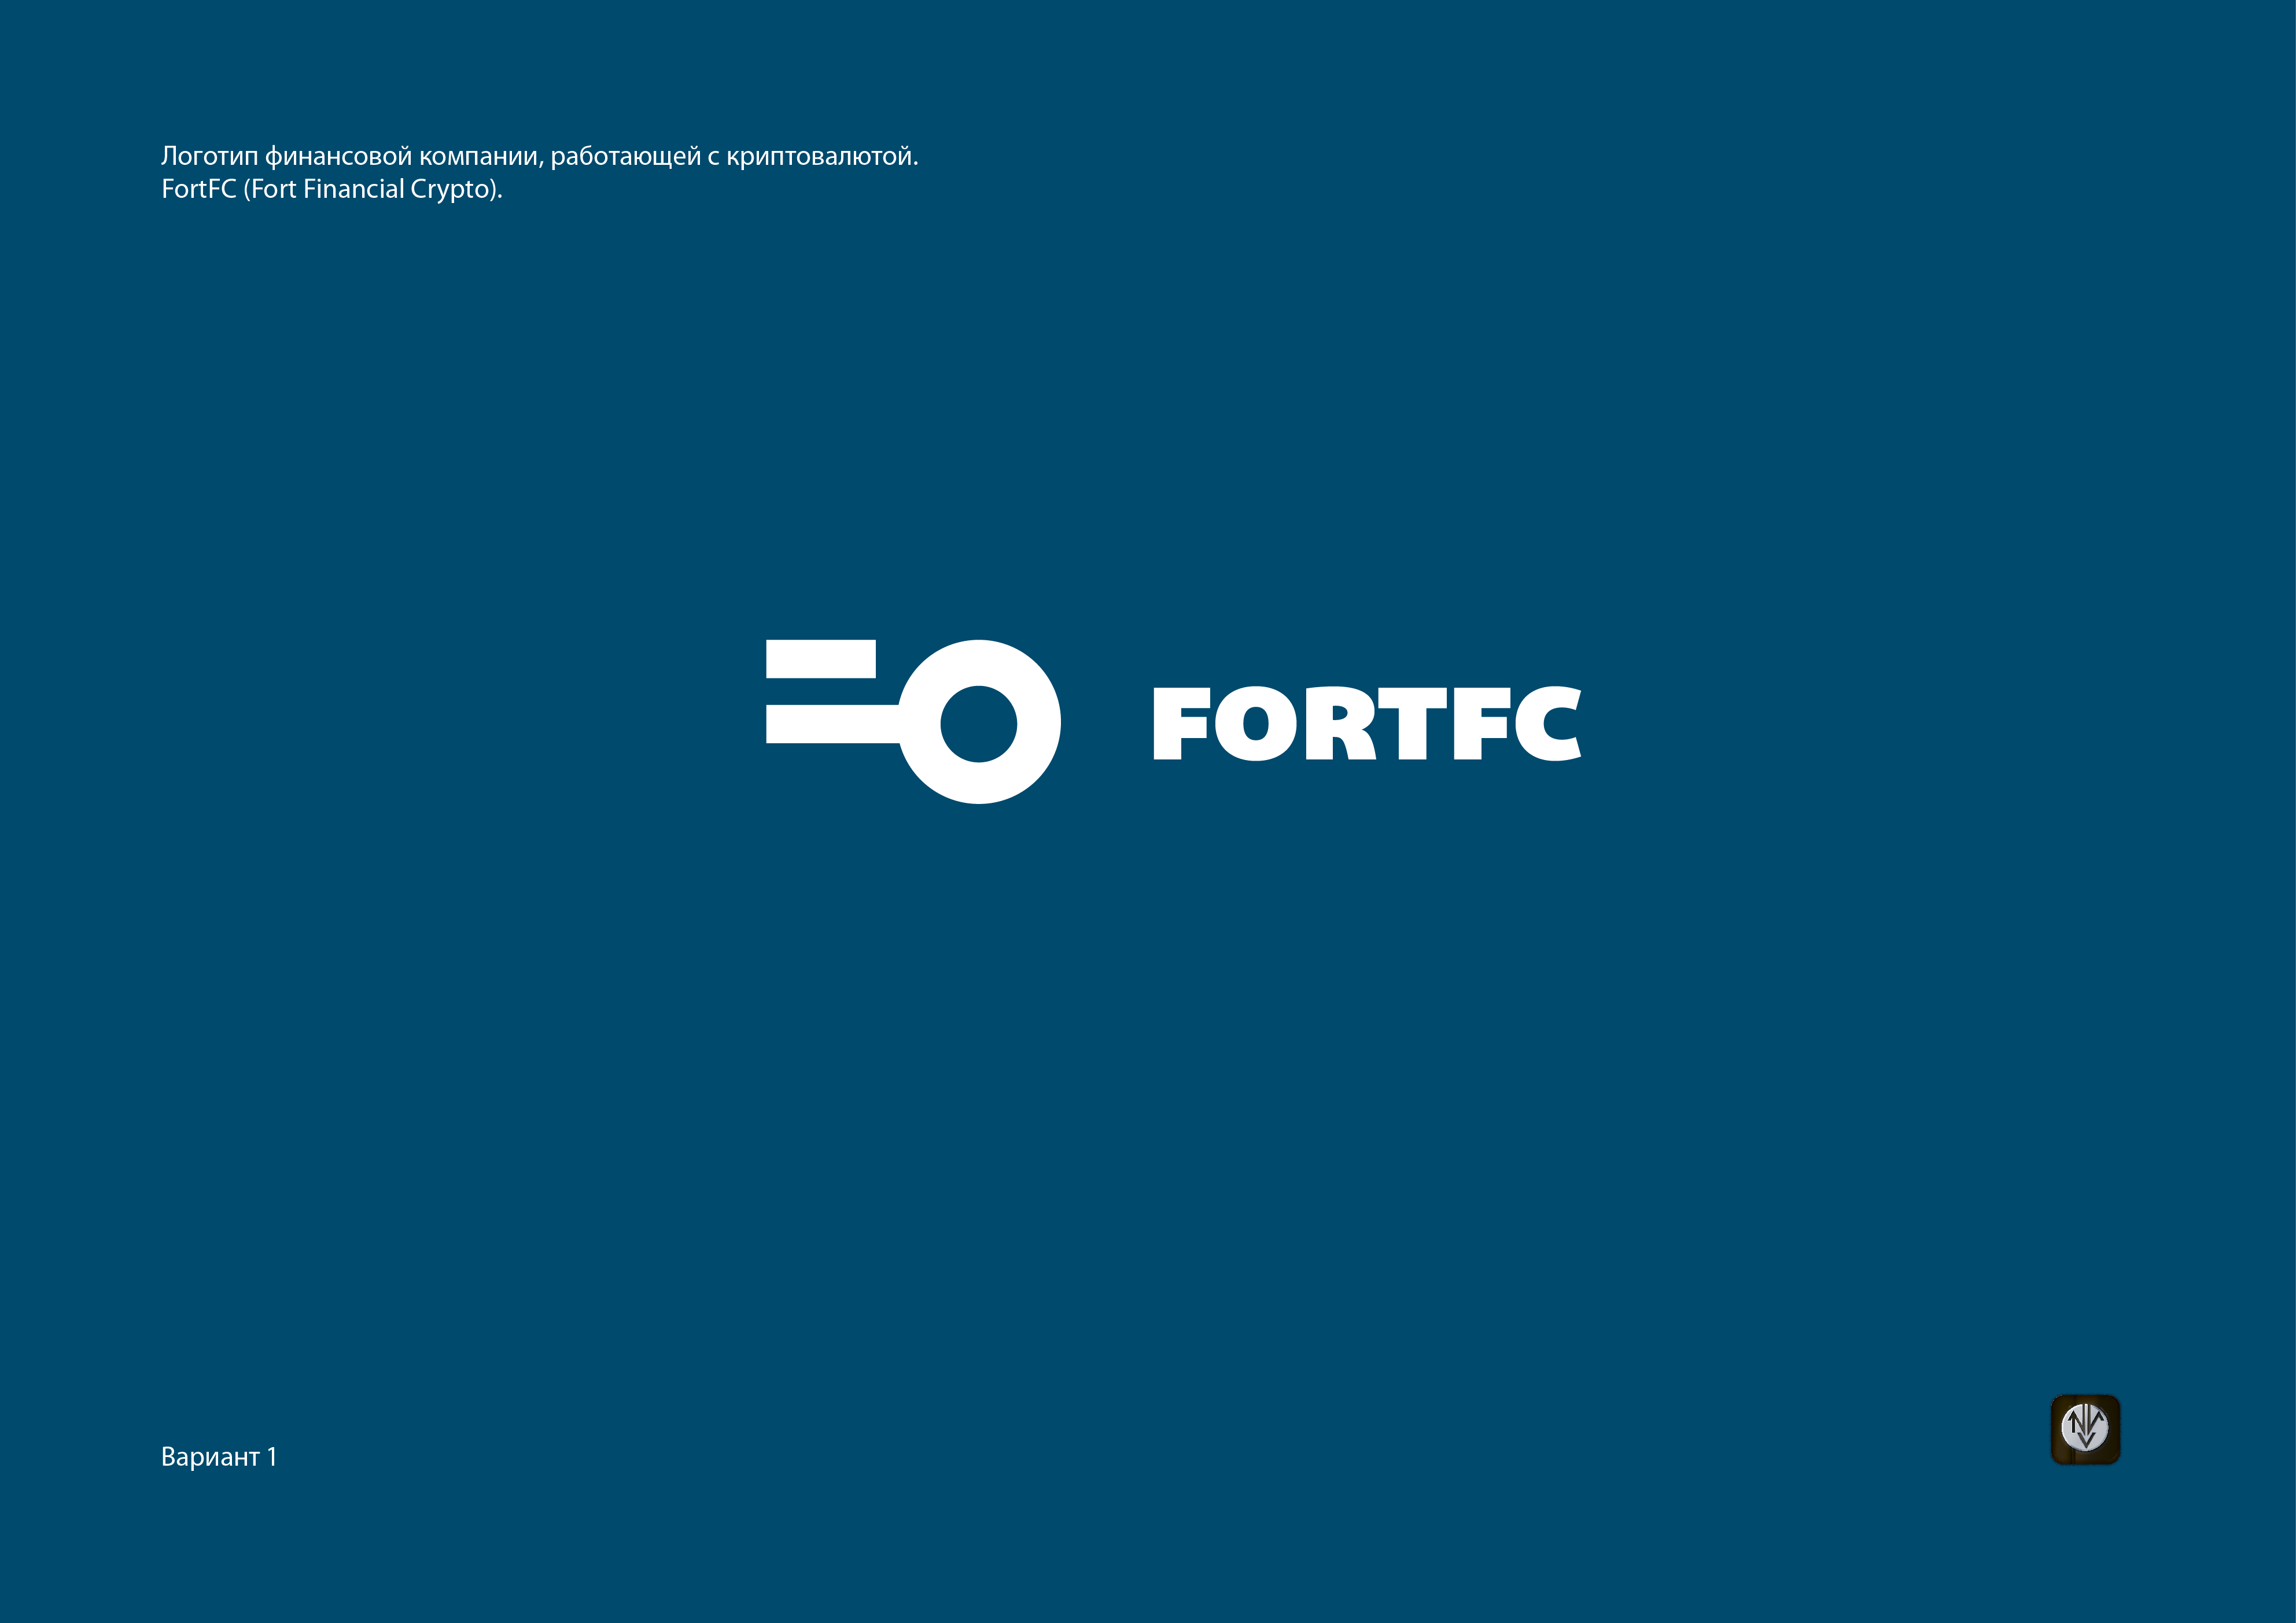 Разработка логотипа финансовой компании фото f_7245a888cf3988c4.png